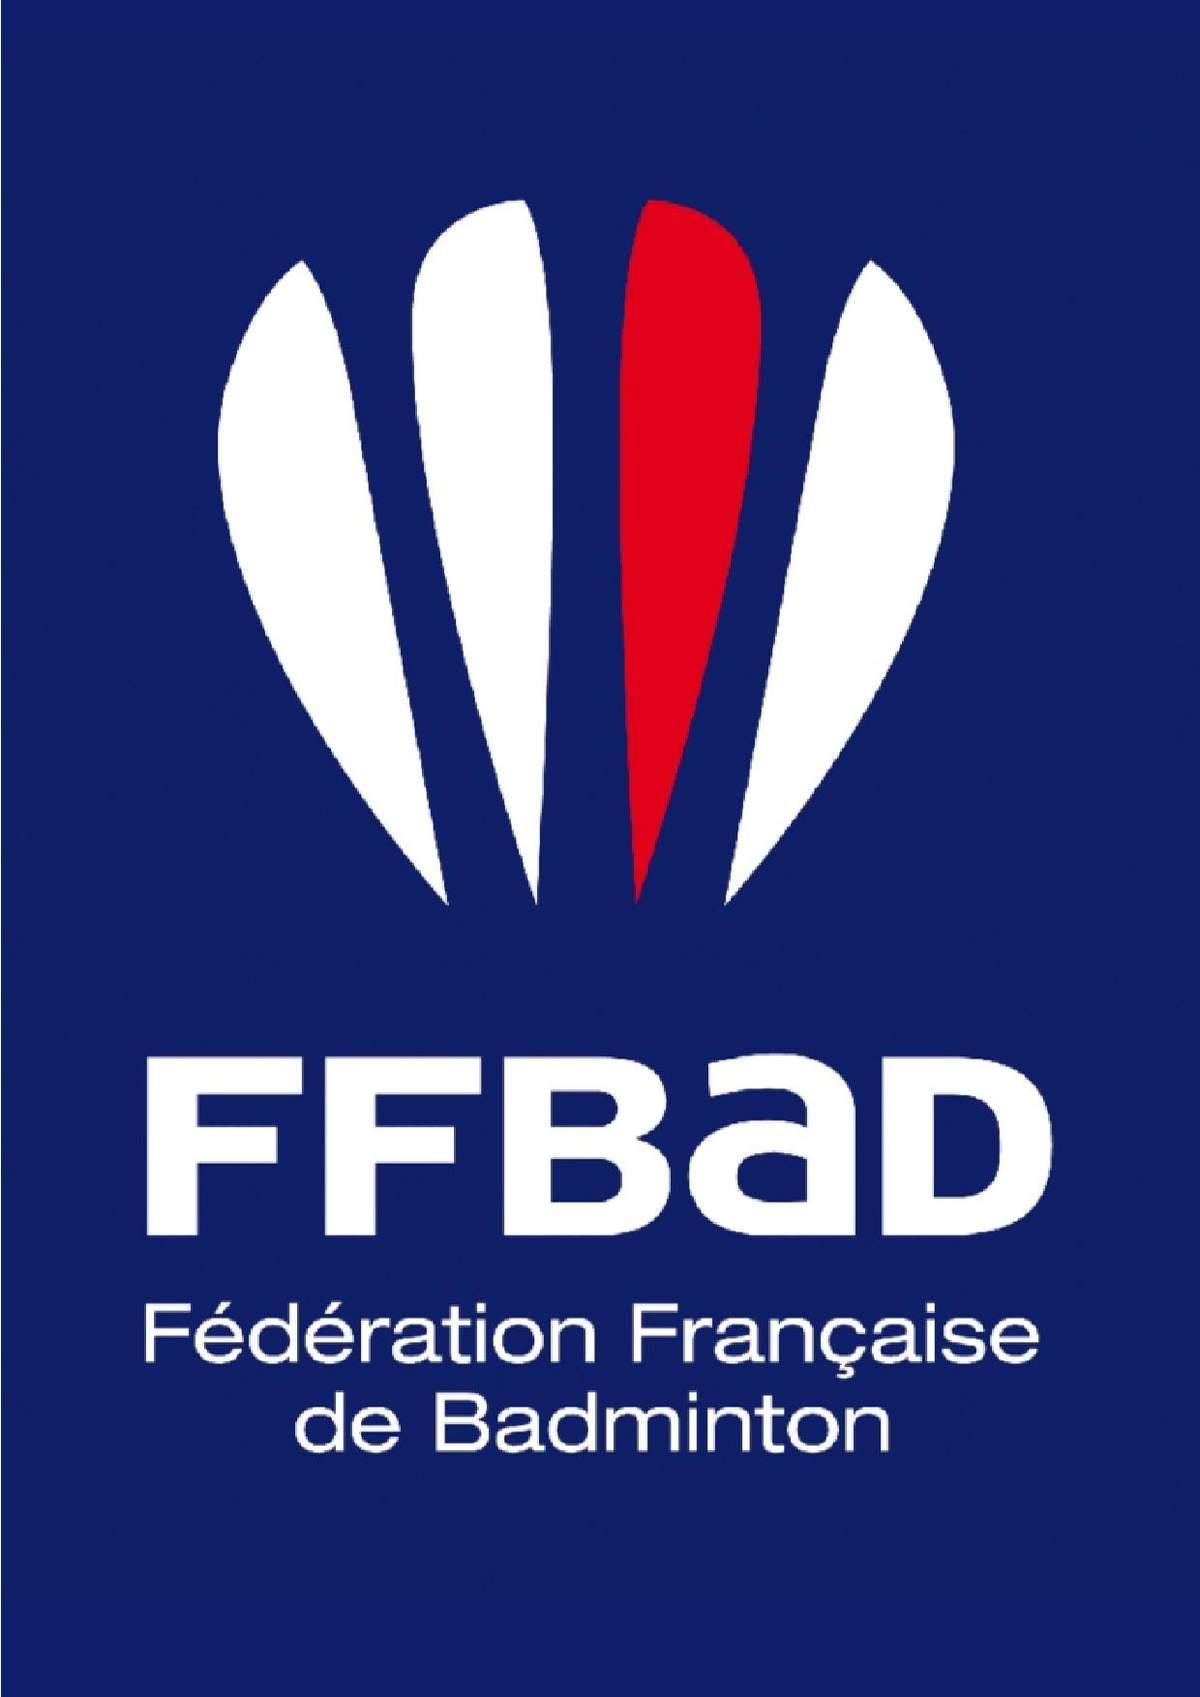 Badminton Ffb